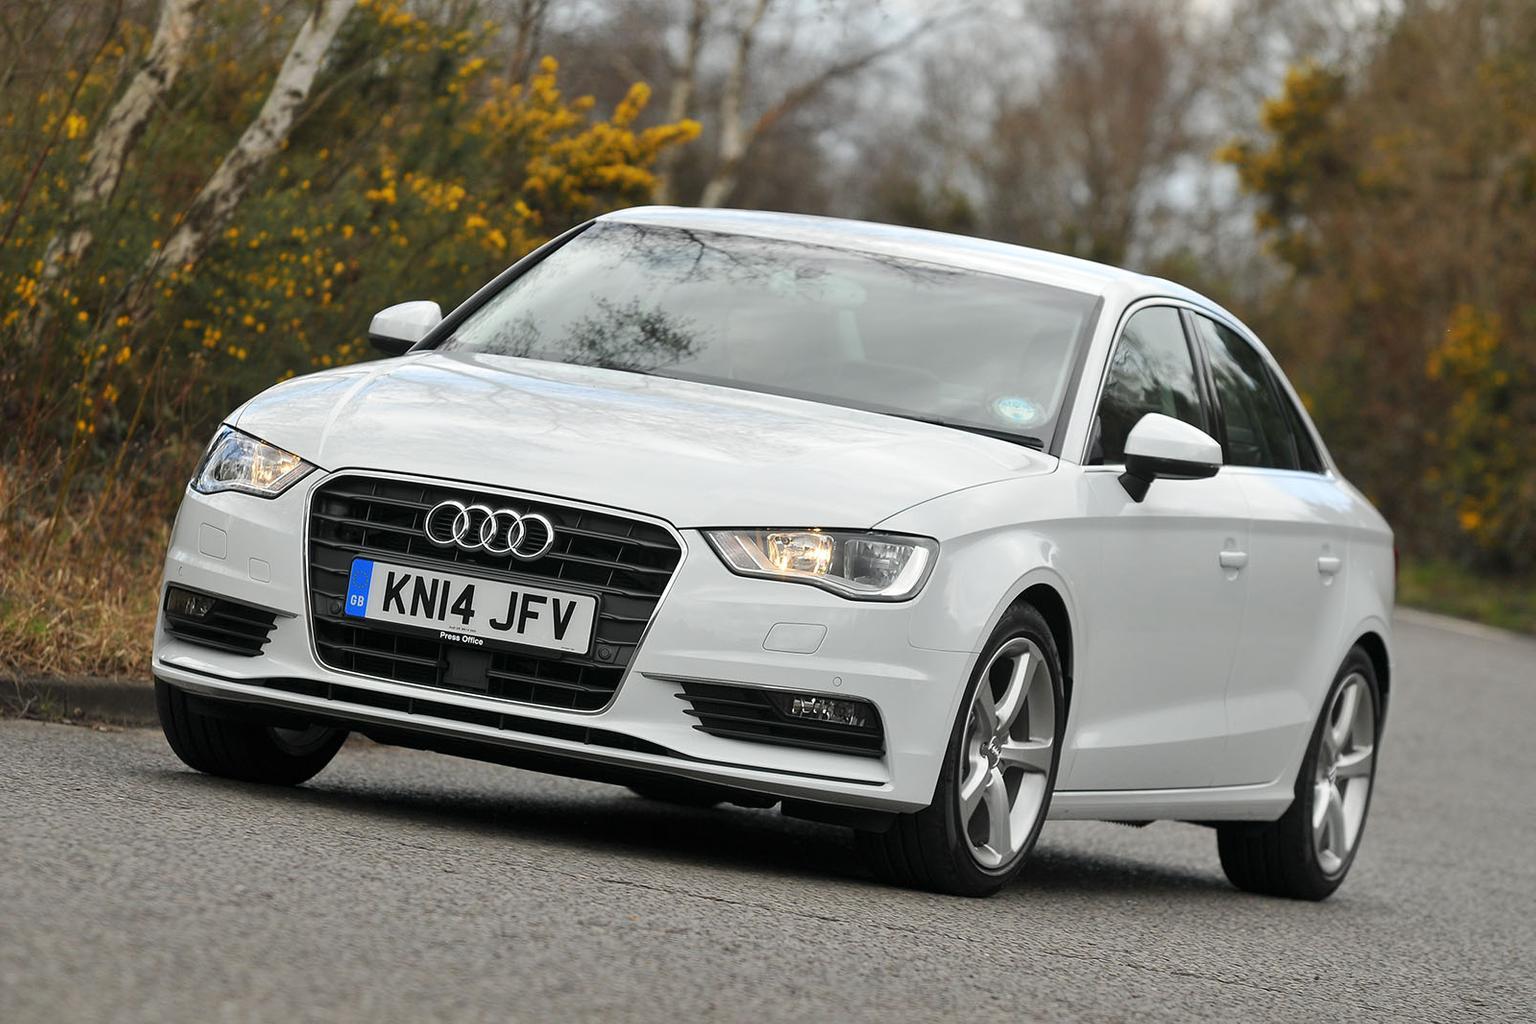 Used Audi A3 Saloon 13-present